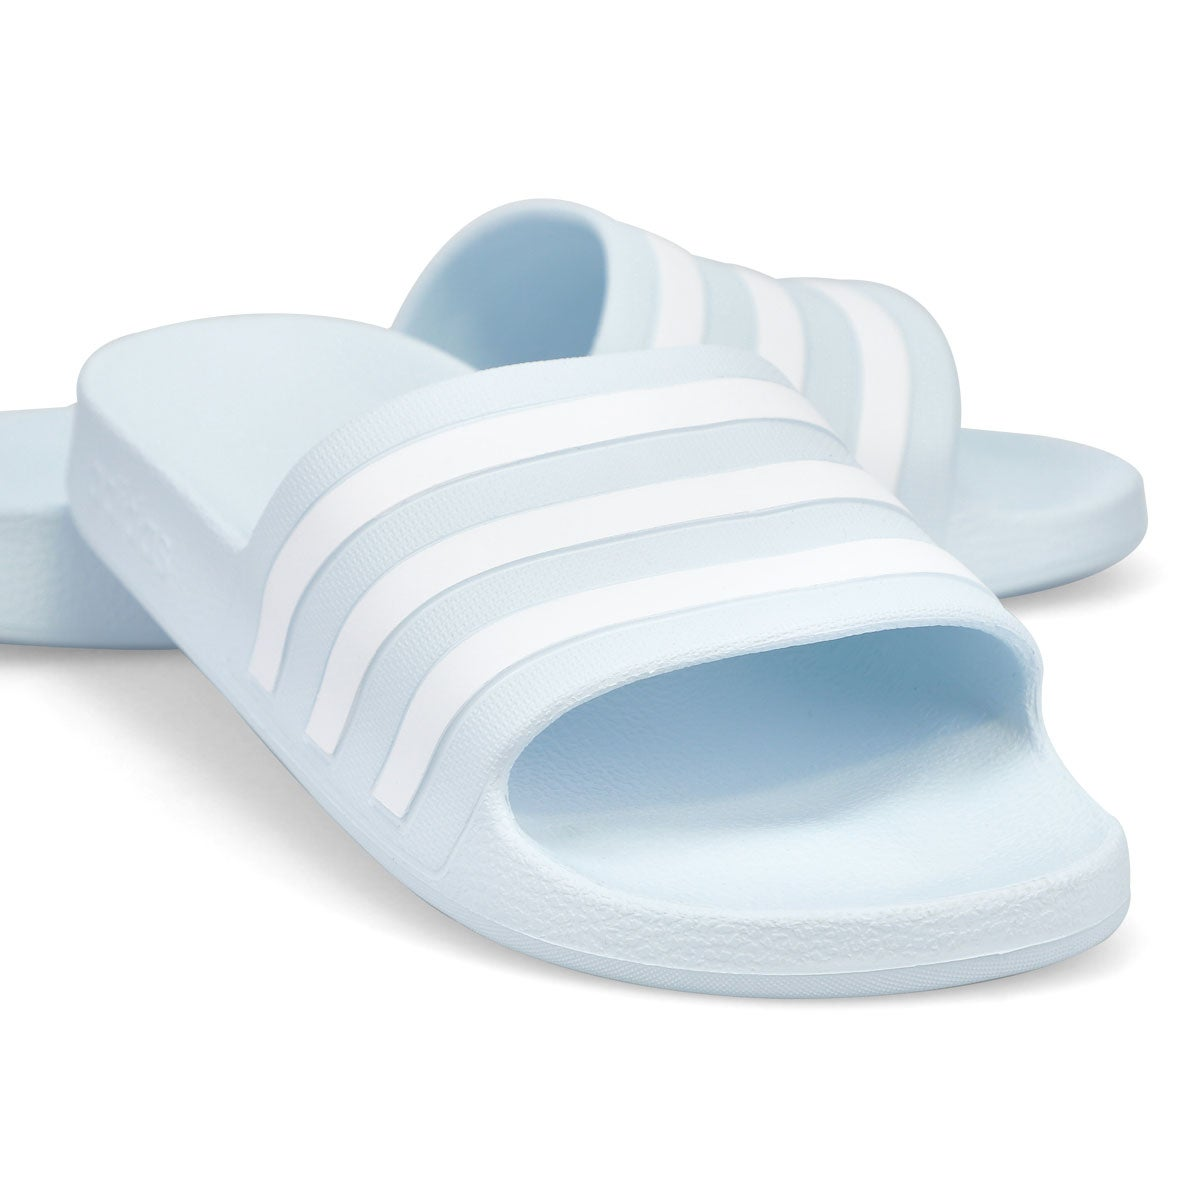 Women's Adilette Aqua Halo Slide Sandal - Blue/Wht